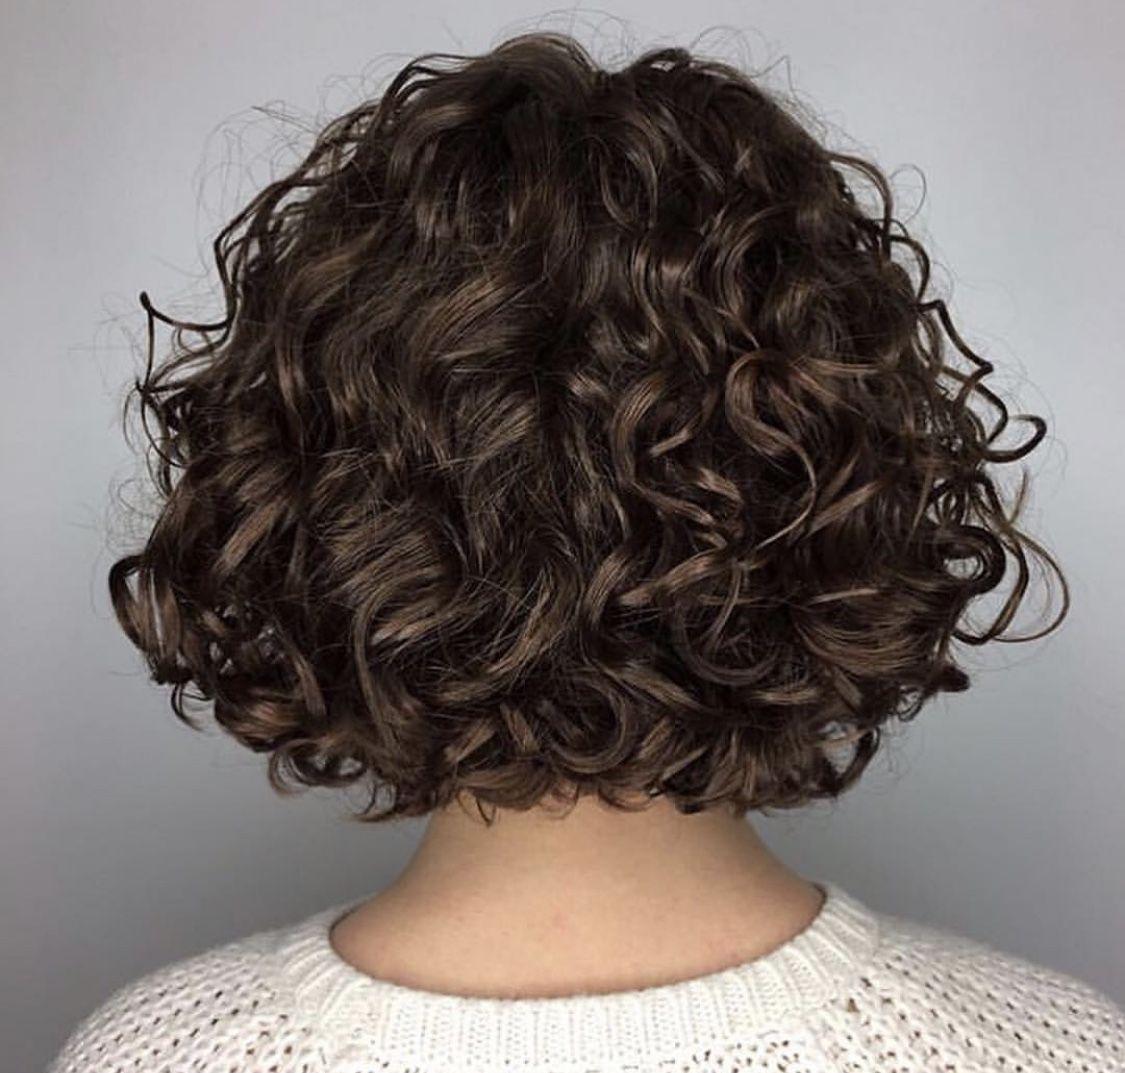 Avedaibw In 2020 Spiral Perm Short Hair Permed Hairstyles Short Permed Hair